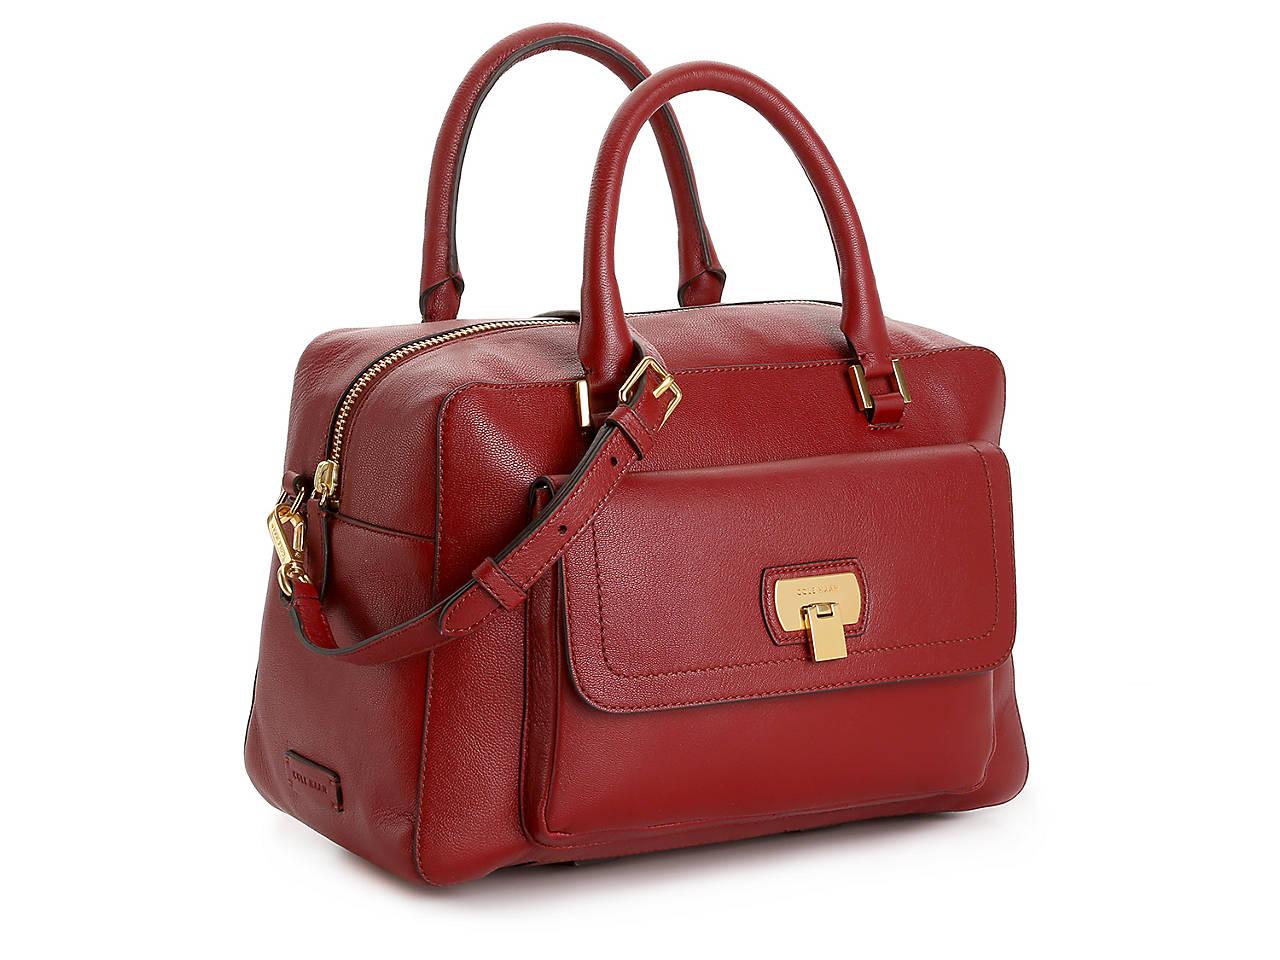 8acb33fb0f9 Cole Haan Hinge Lock Leather Satchel Women's Handbags & Accessories ...